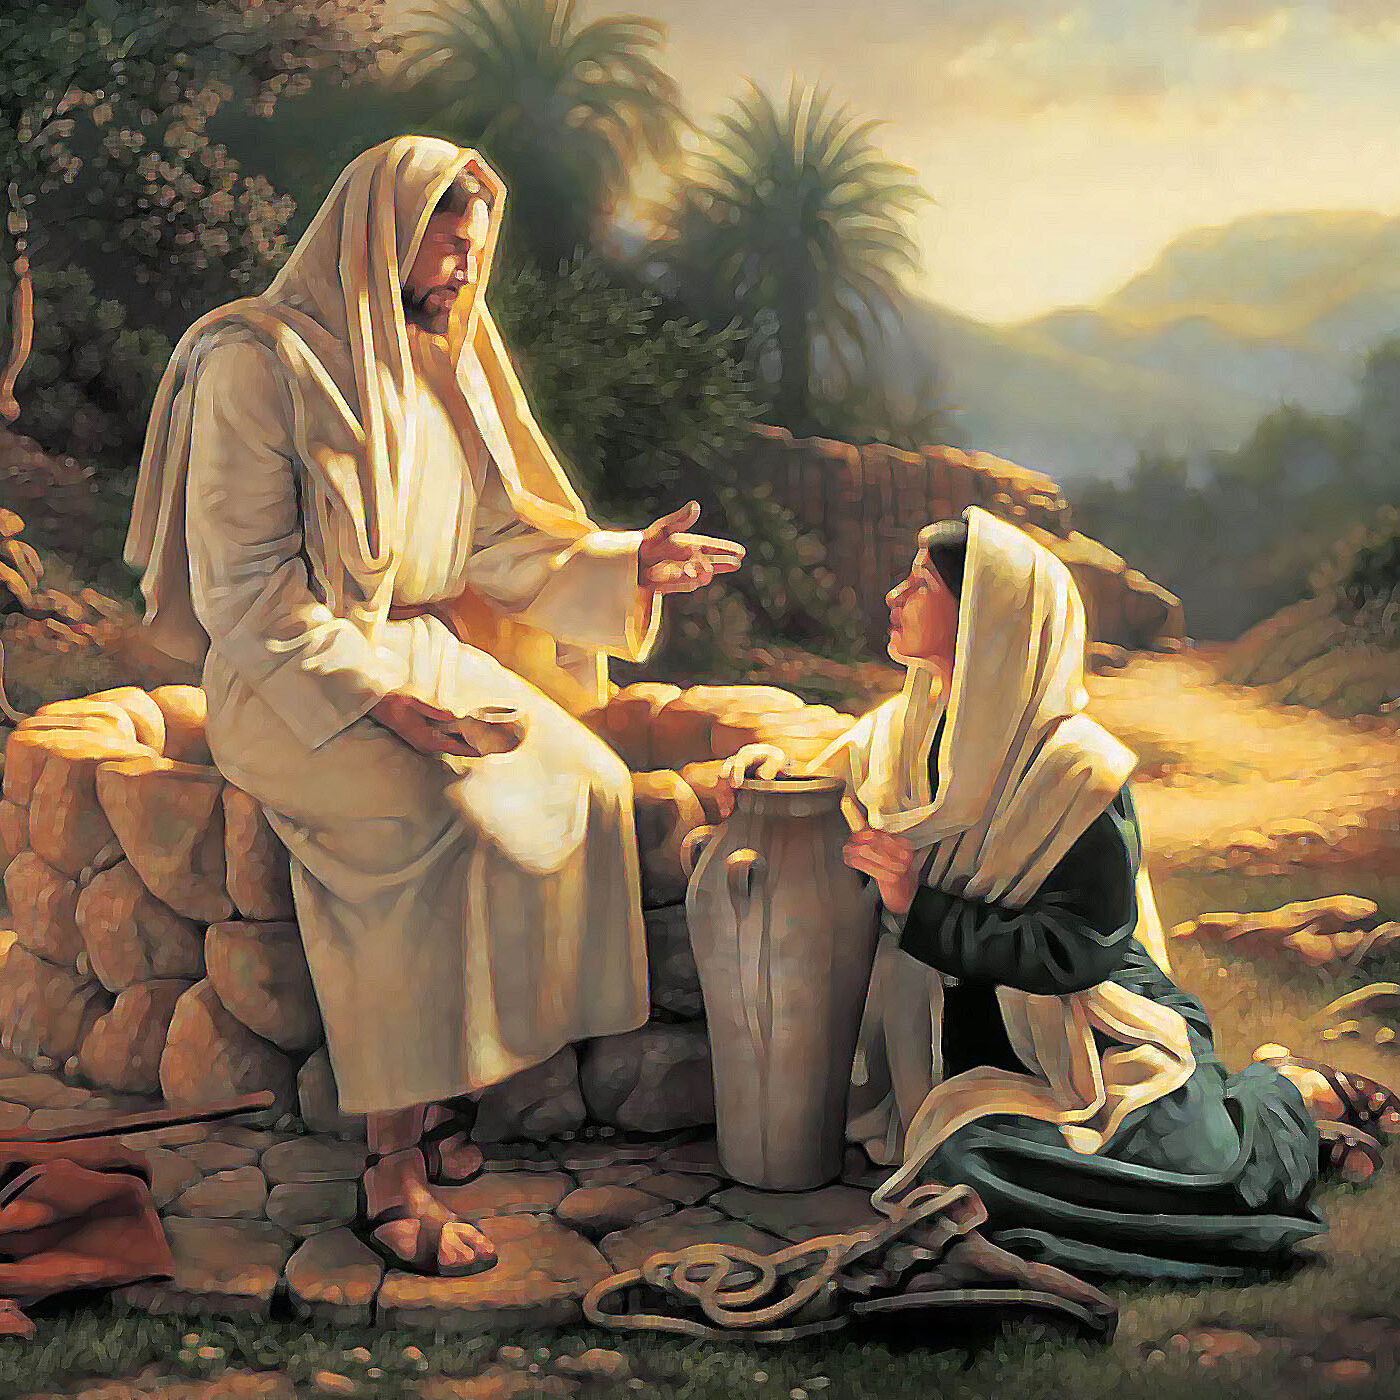 riflessioni sul Vangelo di Mercoledì 20 Gennaio 2021 (Mc 3, 1-6)